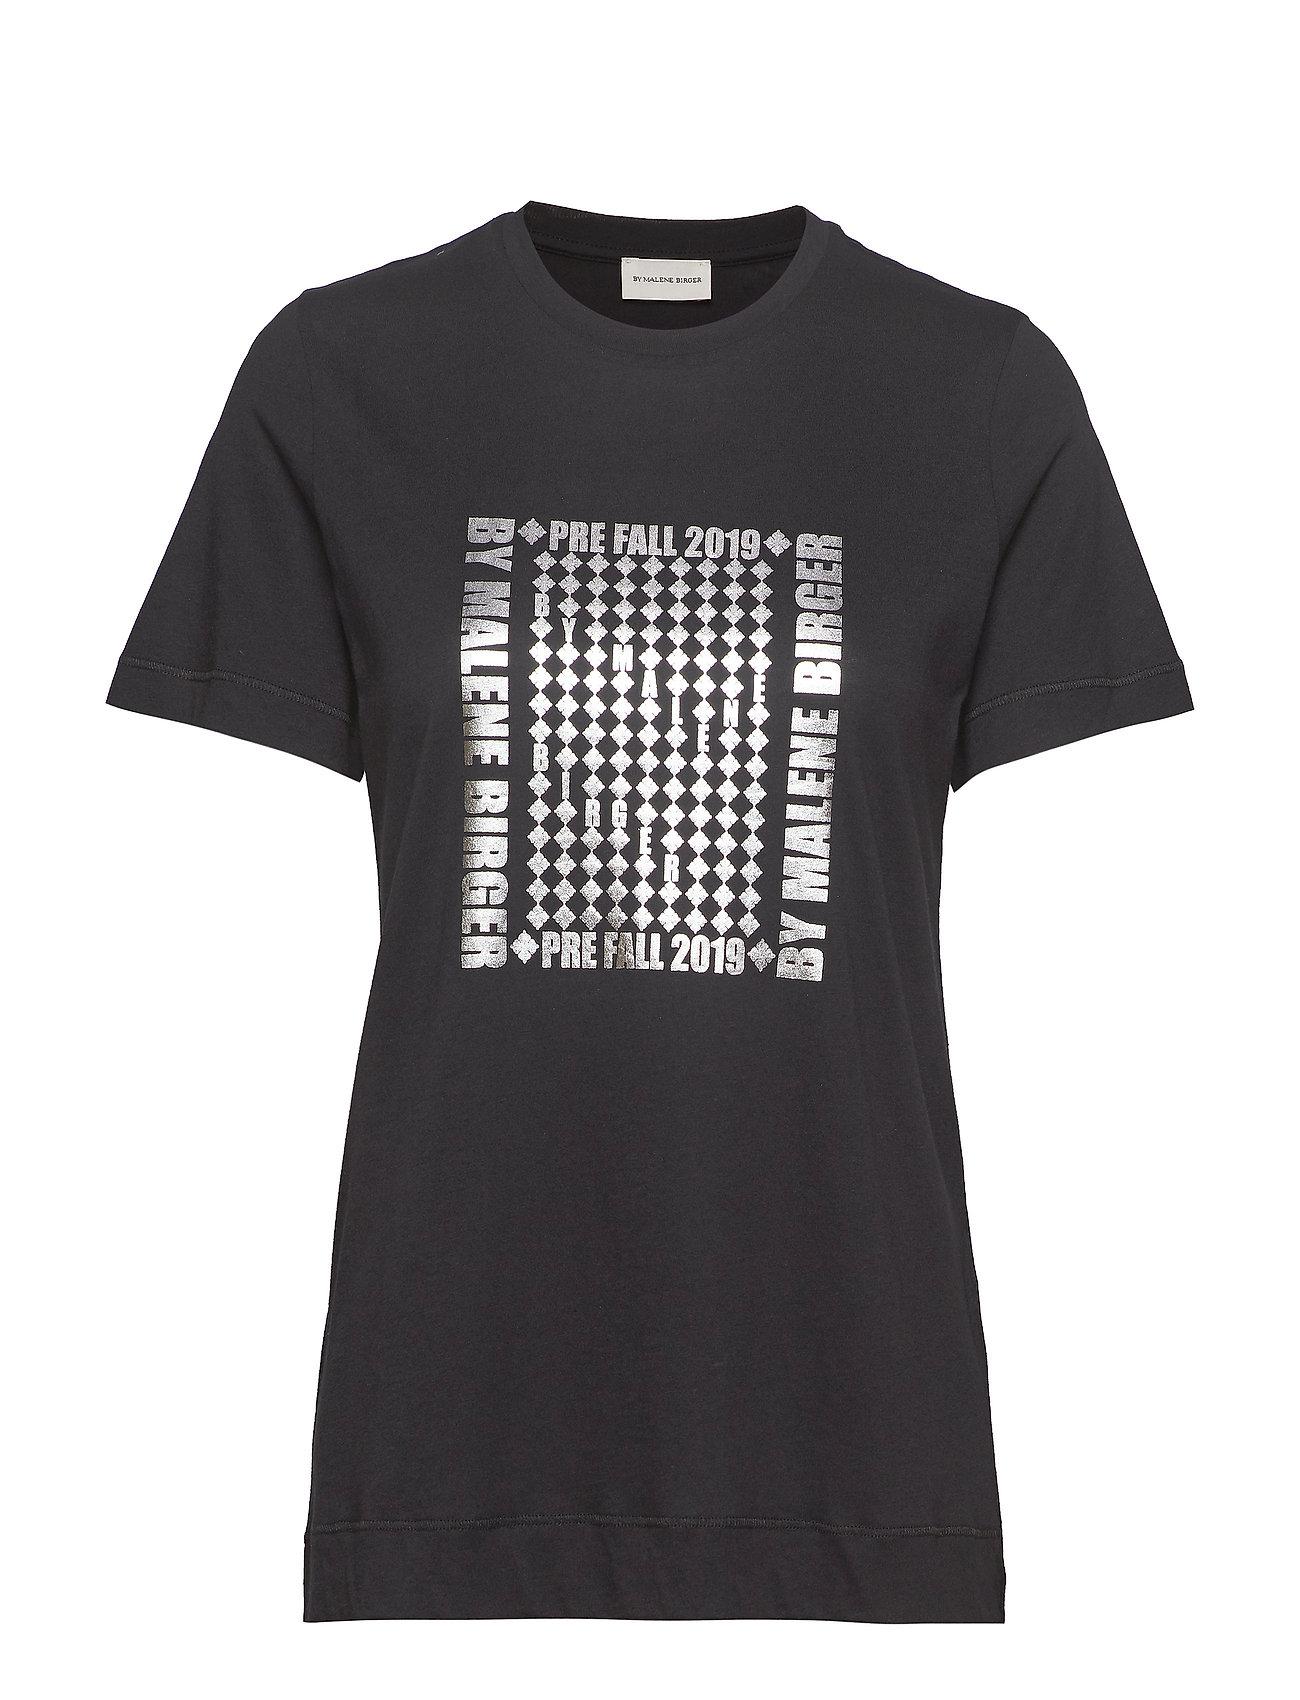 Image of Manja T-shirt Top Sort By Malene Birger (3173240173)